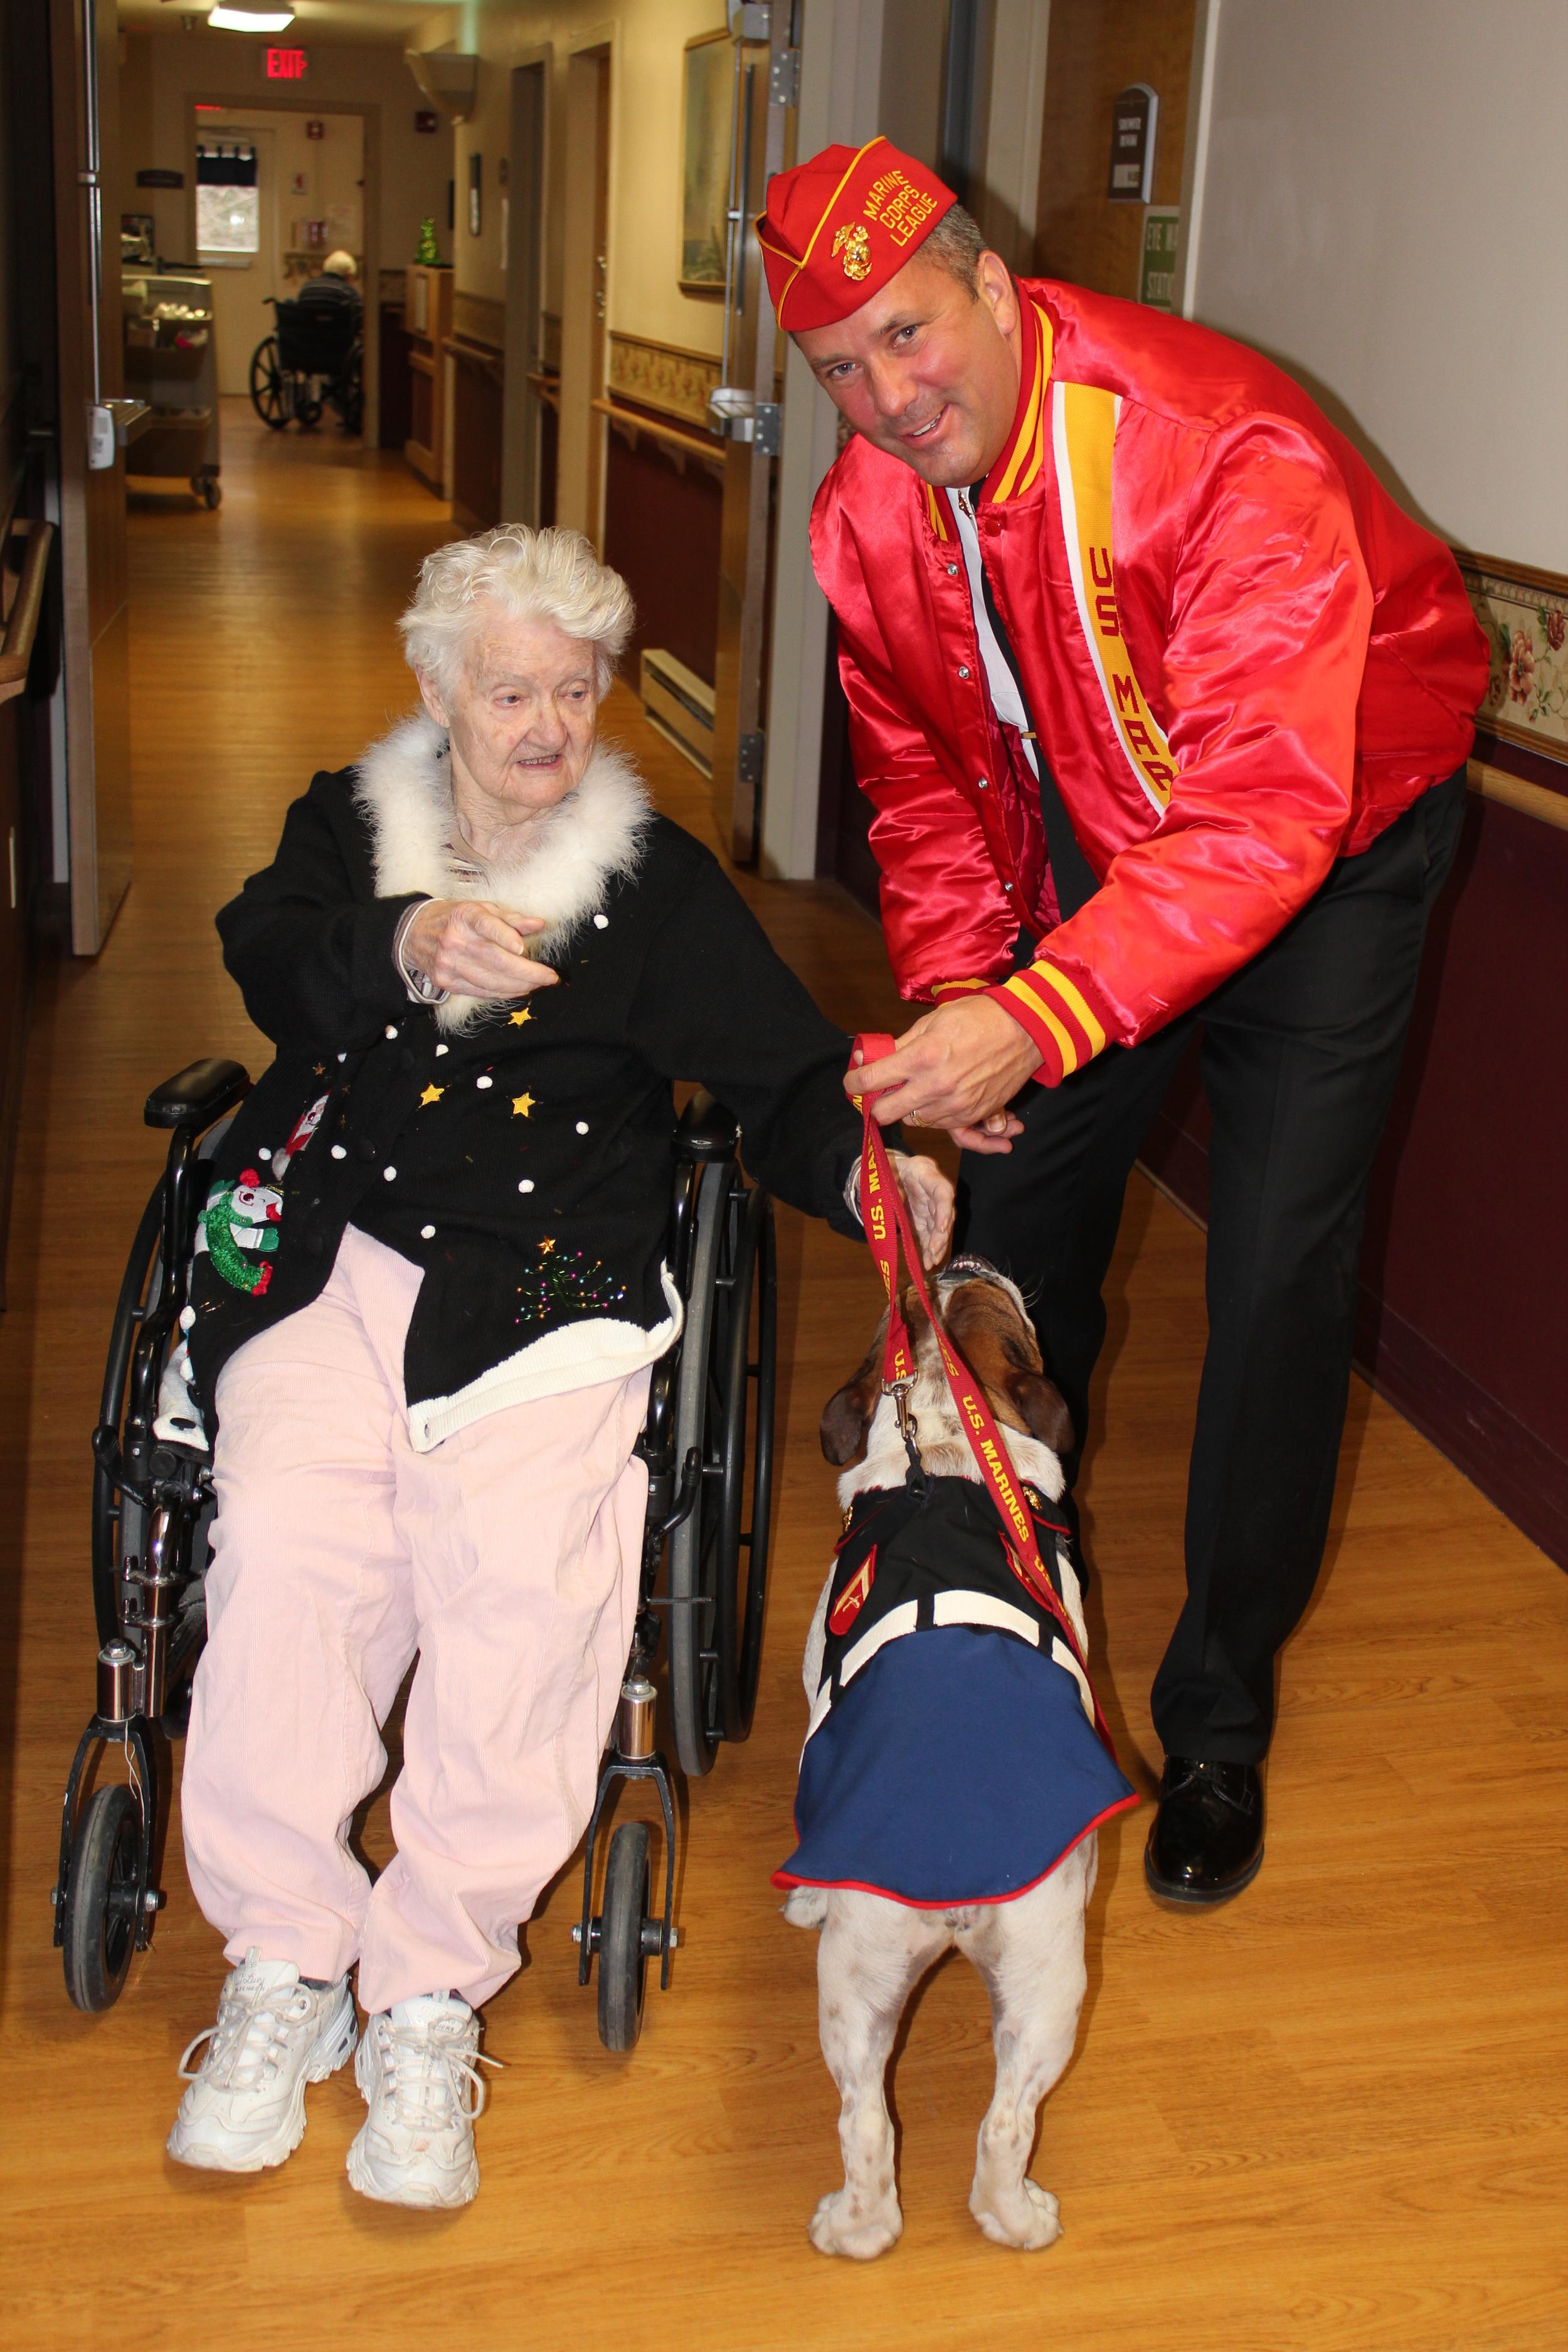 mosser nursing home december 2014 (9).JPG